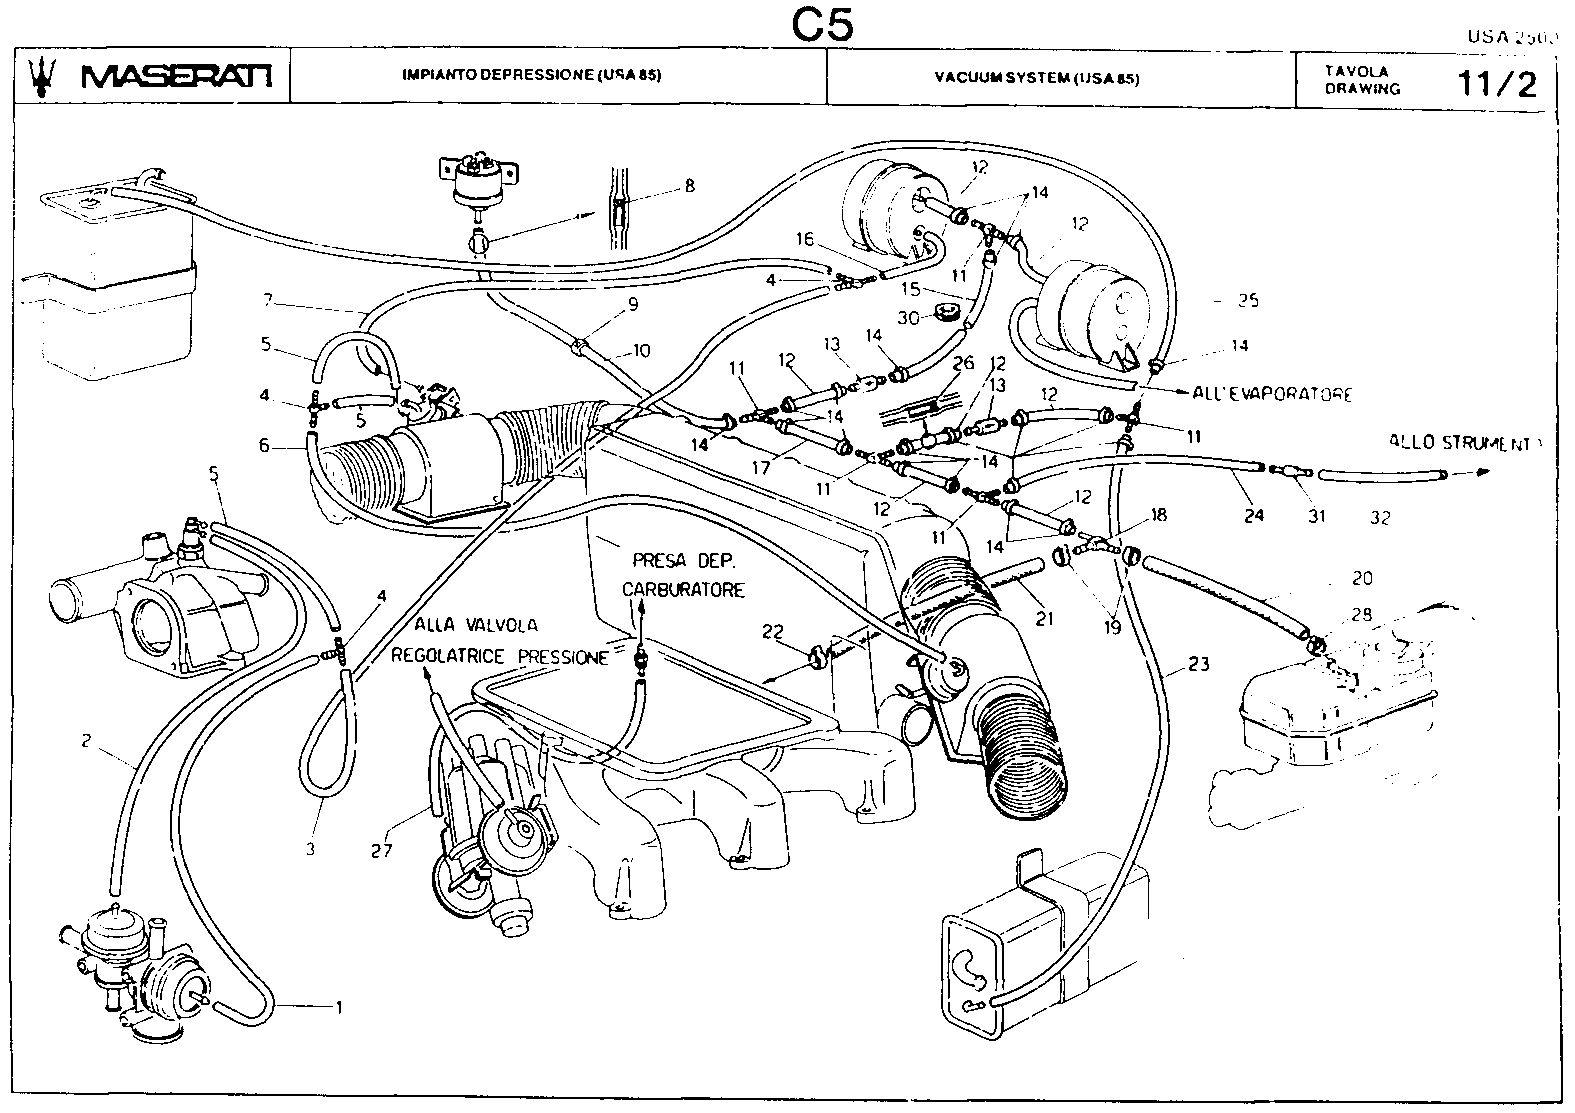 hight resolution of wiring diagram on maserati biturbo wiring as well maserati biturbo wiring diagram on maserati biturbo wiring